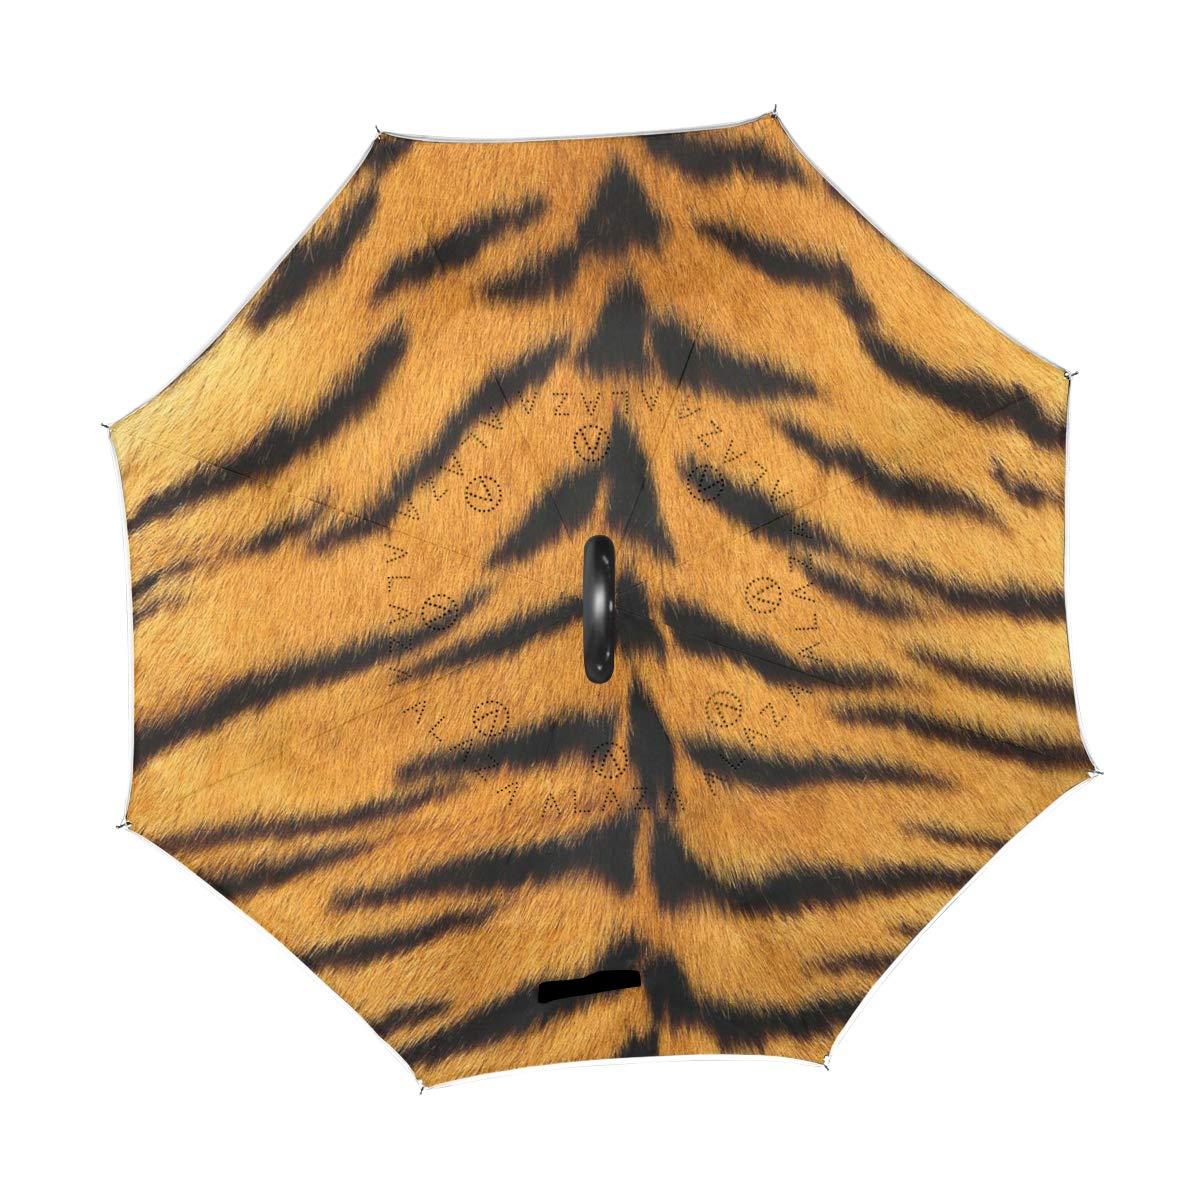 MALPLENA Tiger Fur Patrón Auto Open Paraguas Abierto Abierto Parte Abajo Reverso Inverso Paraguas para Mujer/Hombre/Coche/Lluvia Exterior Impermeable ...